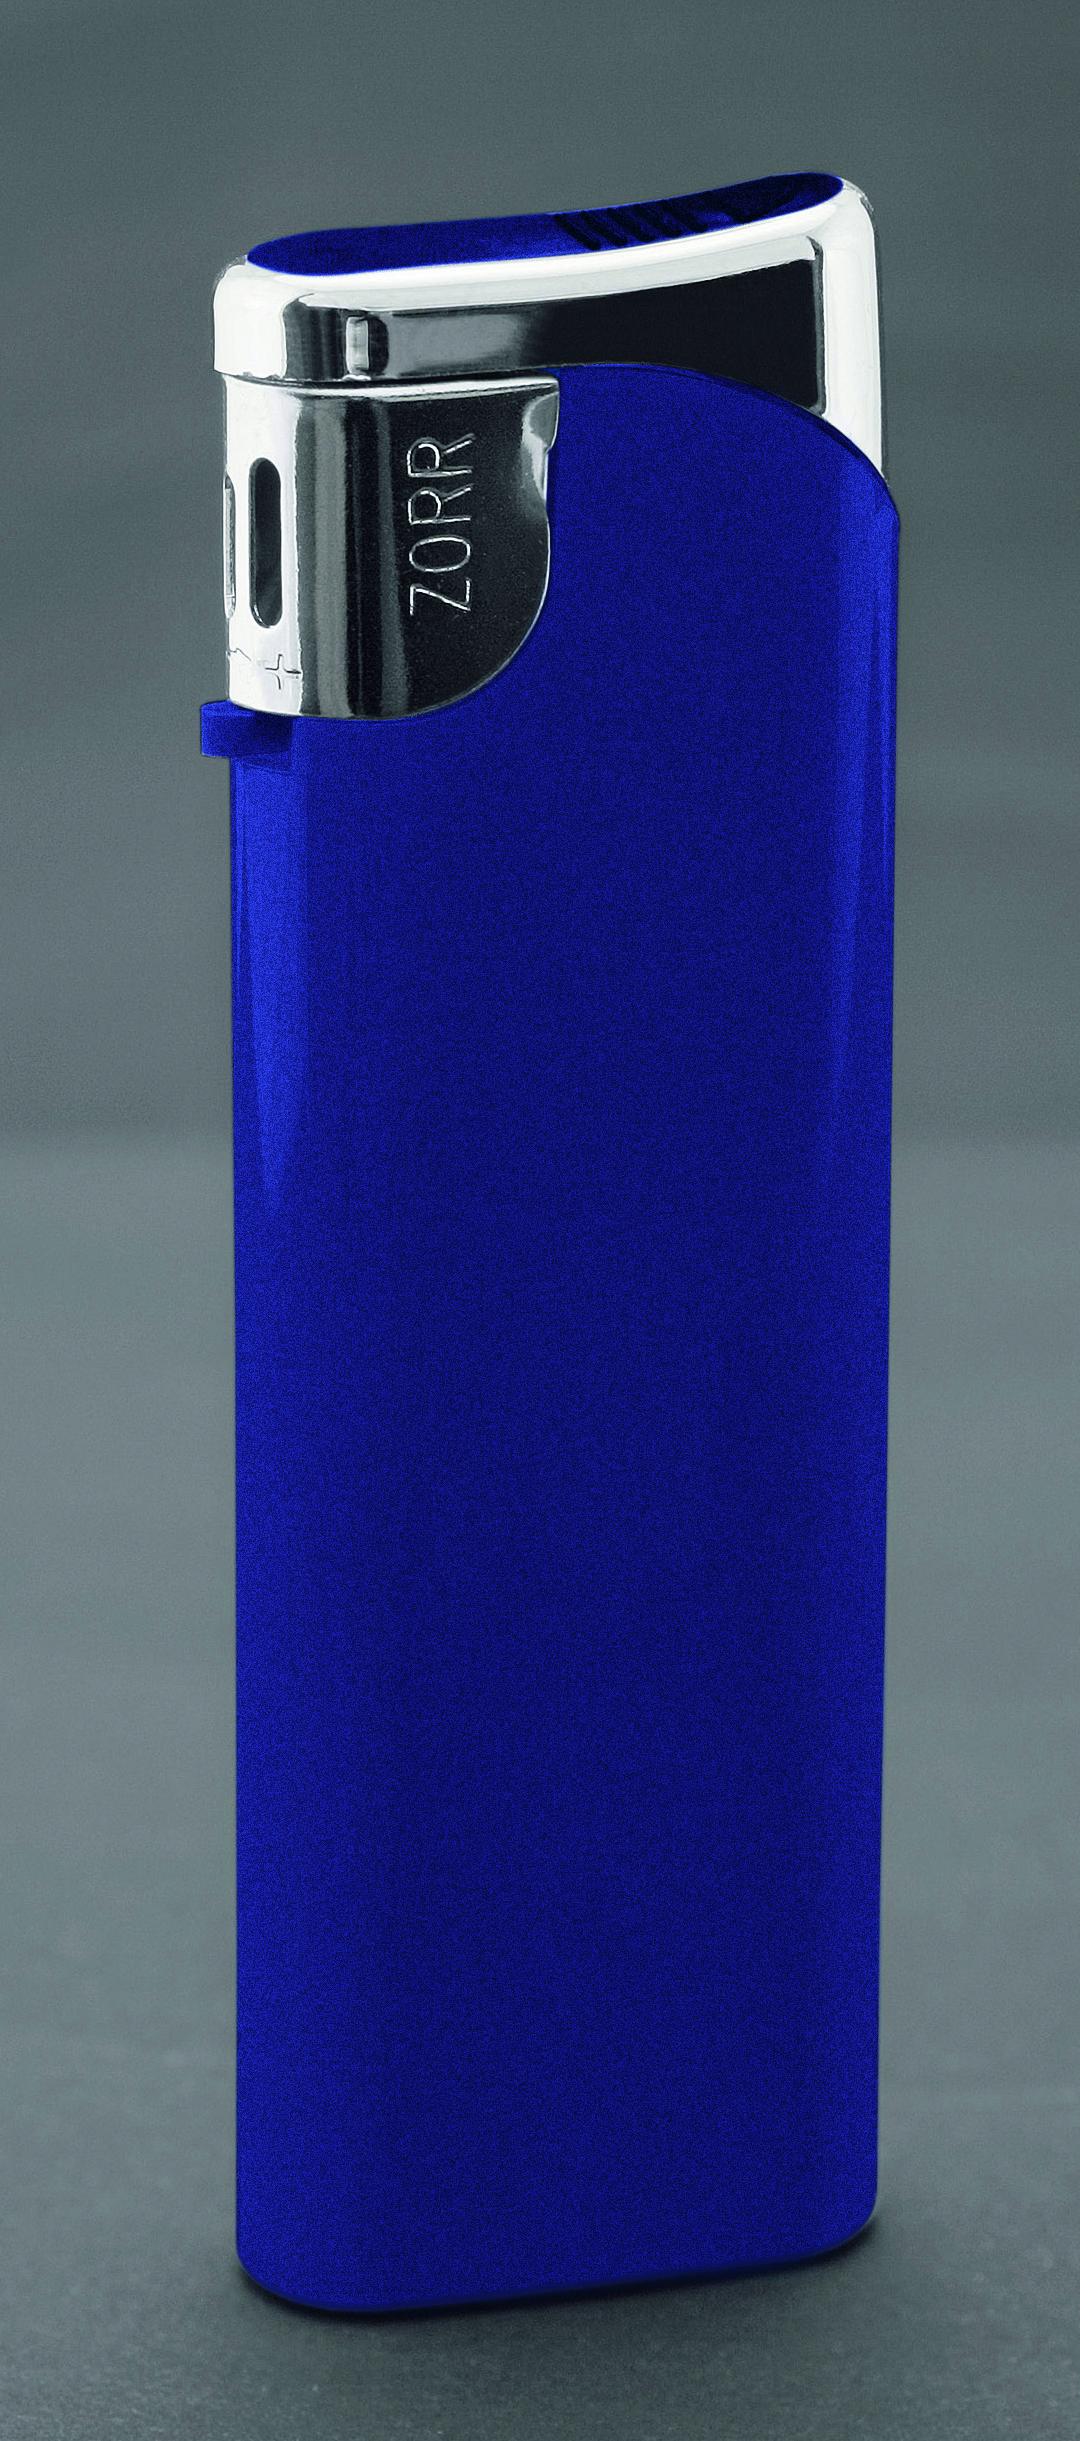 ZORR Slider blau metallic